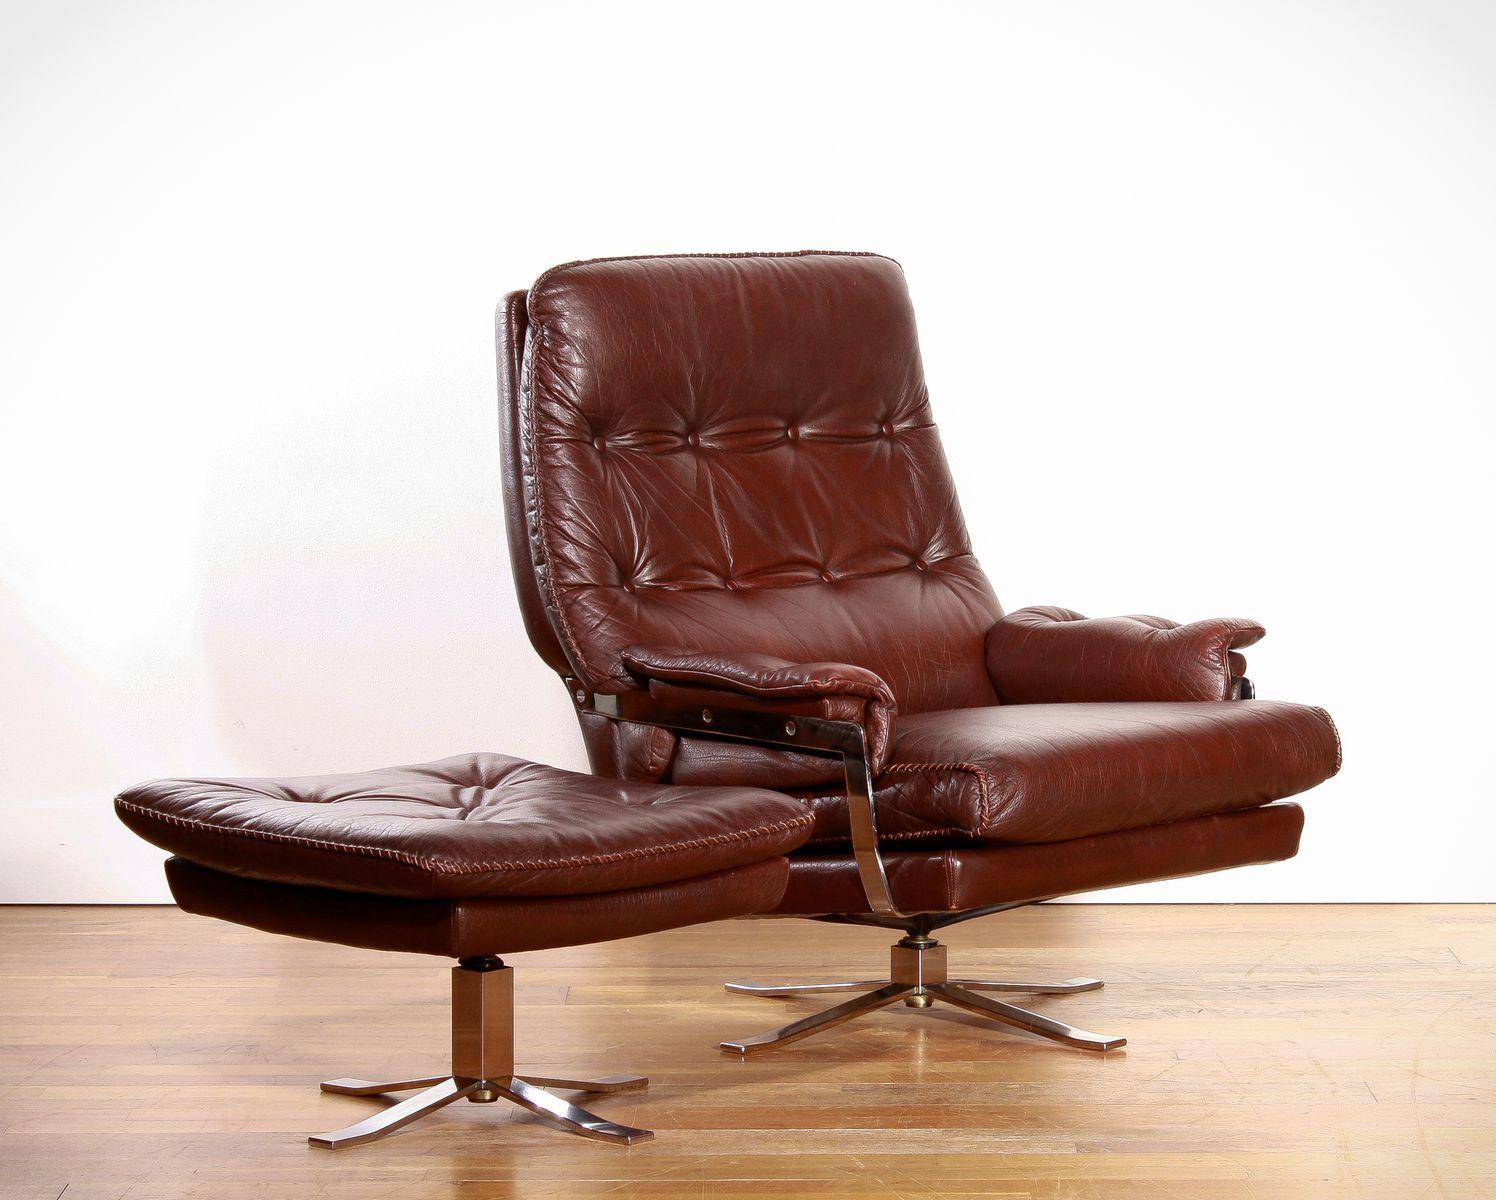 mexa sayulita leather lounge chair